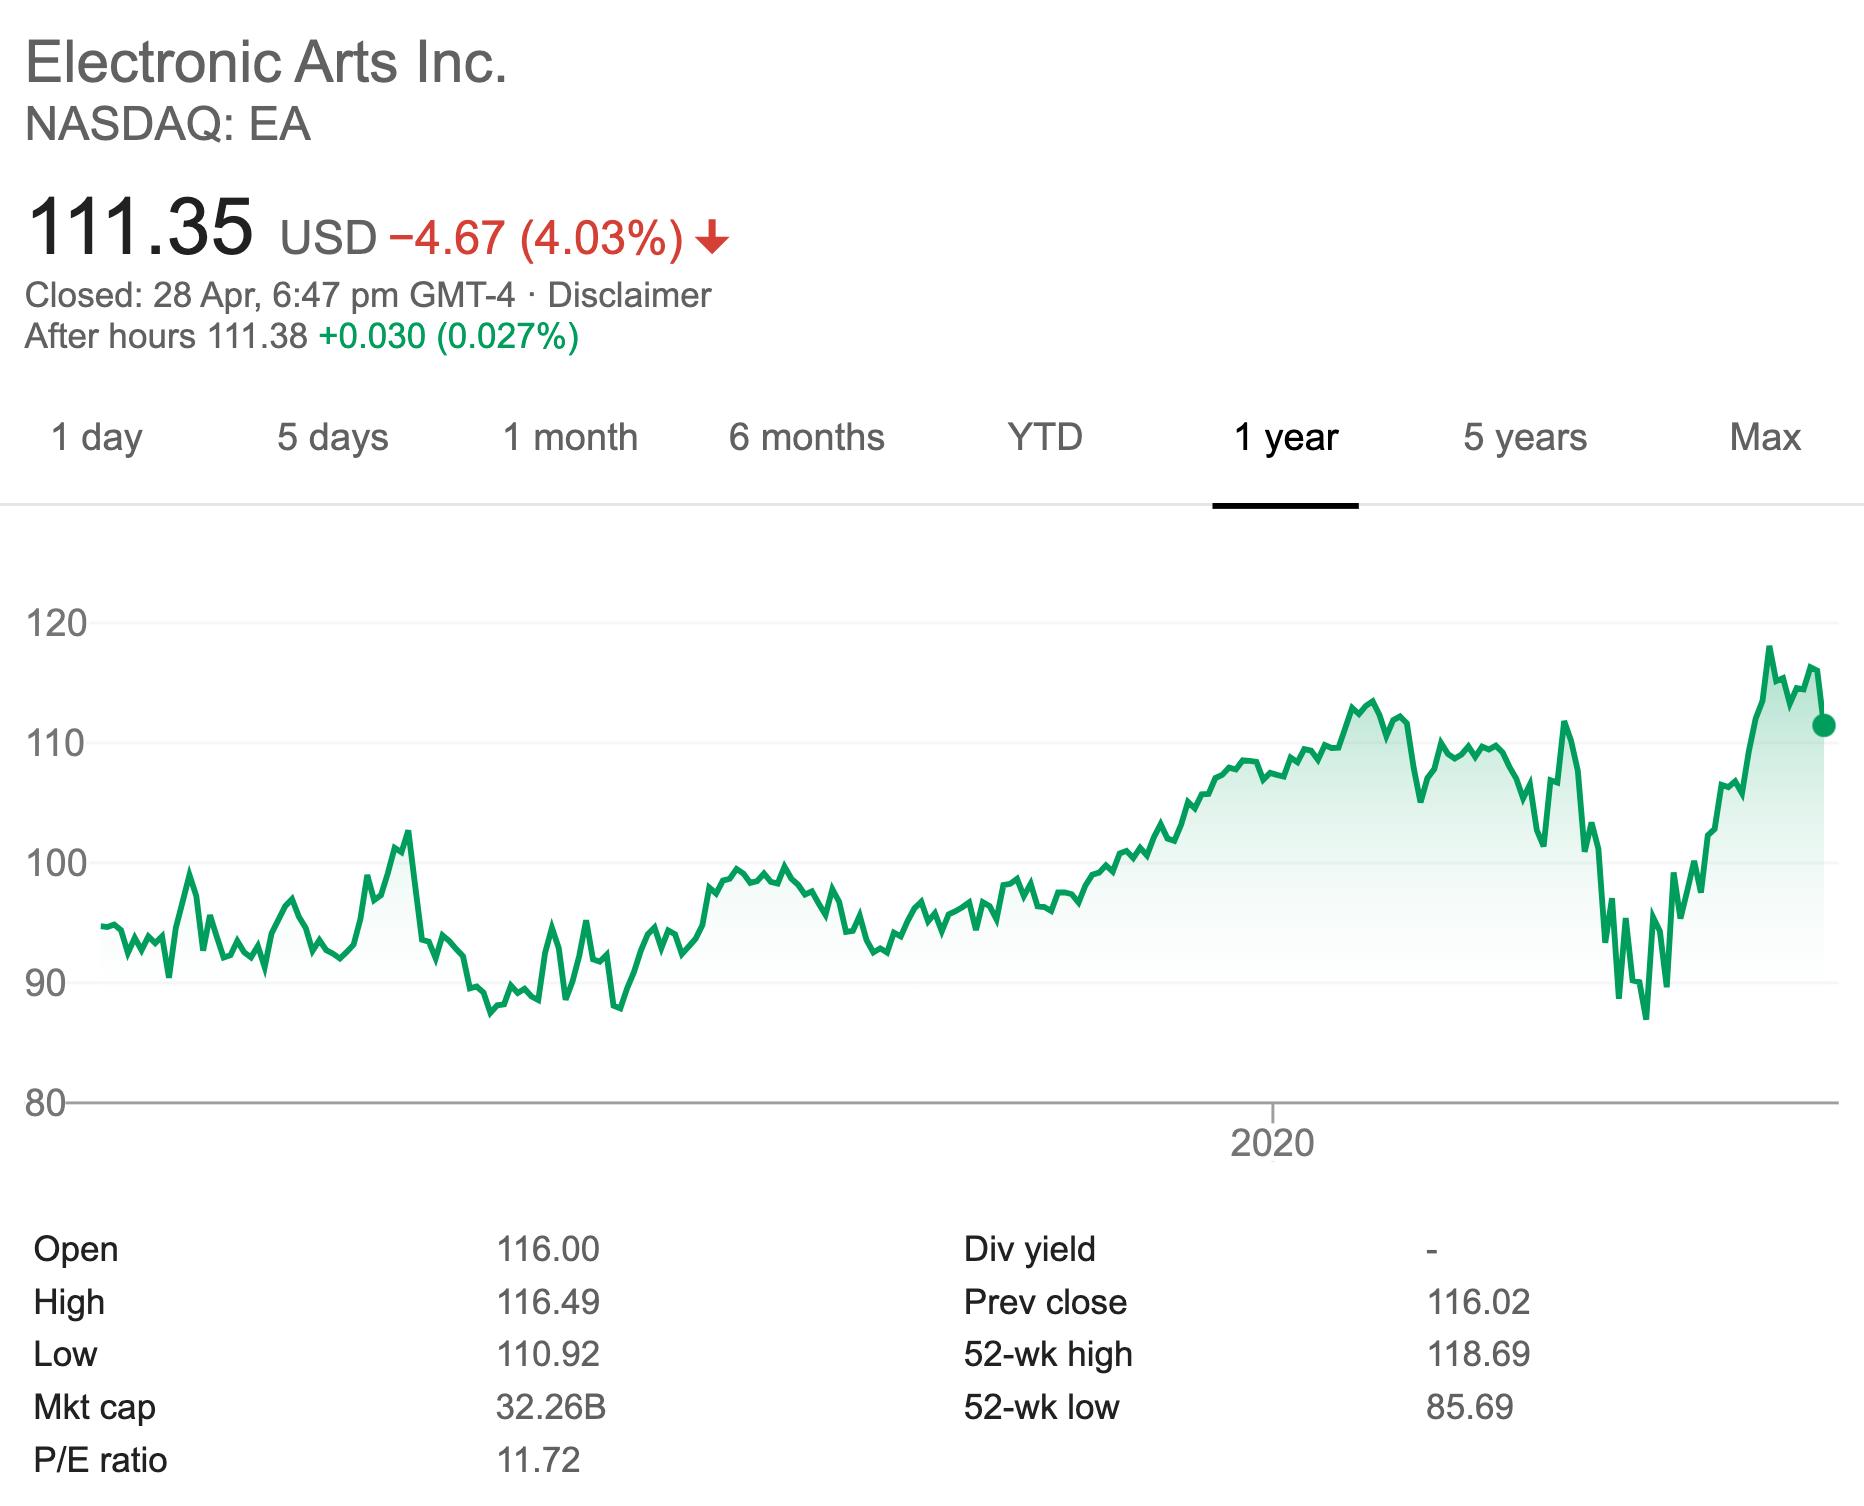 EA - 1 Year Stock Price Performance